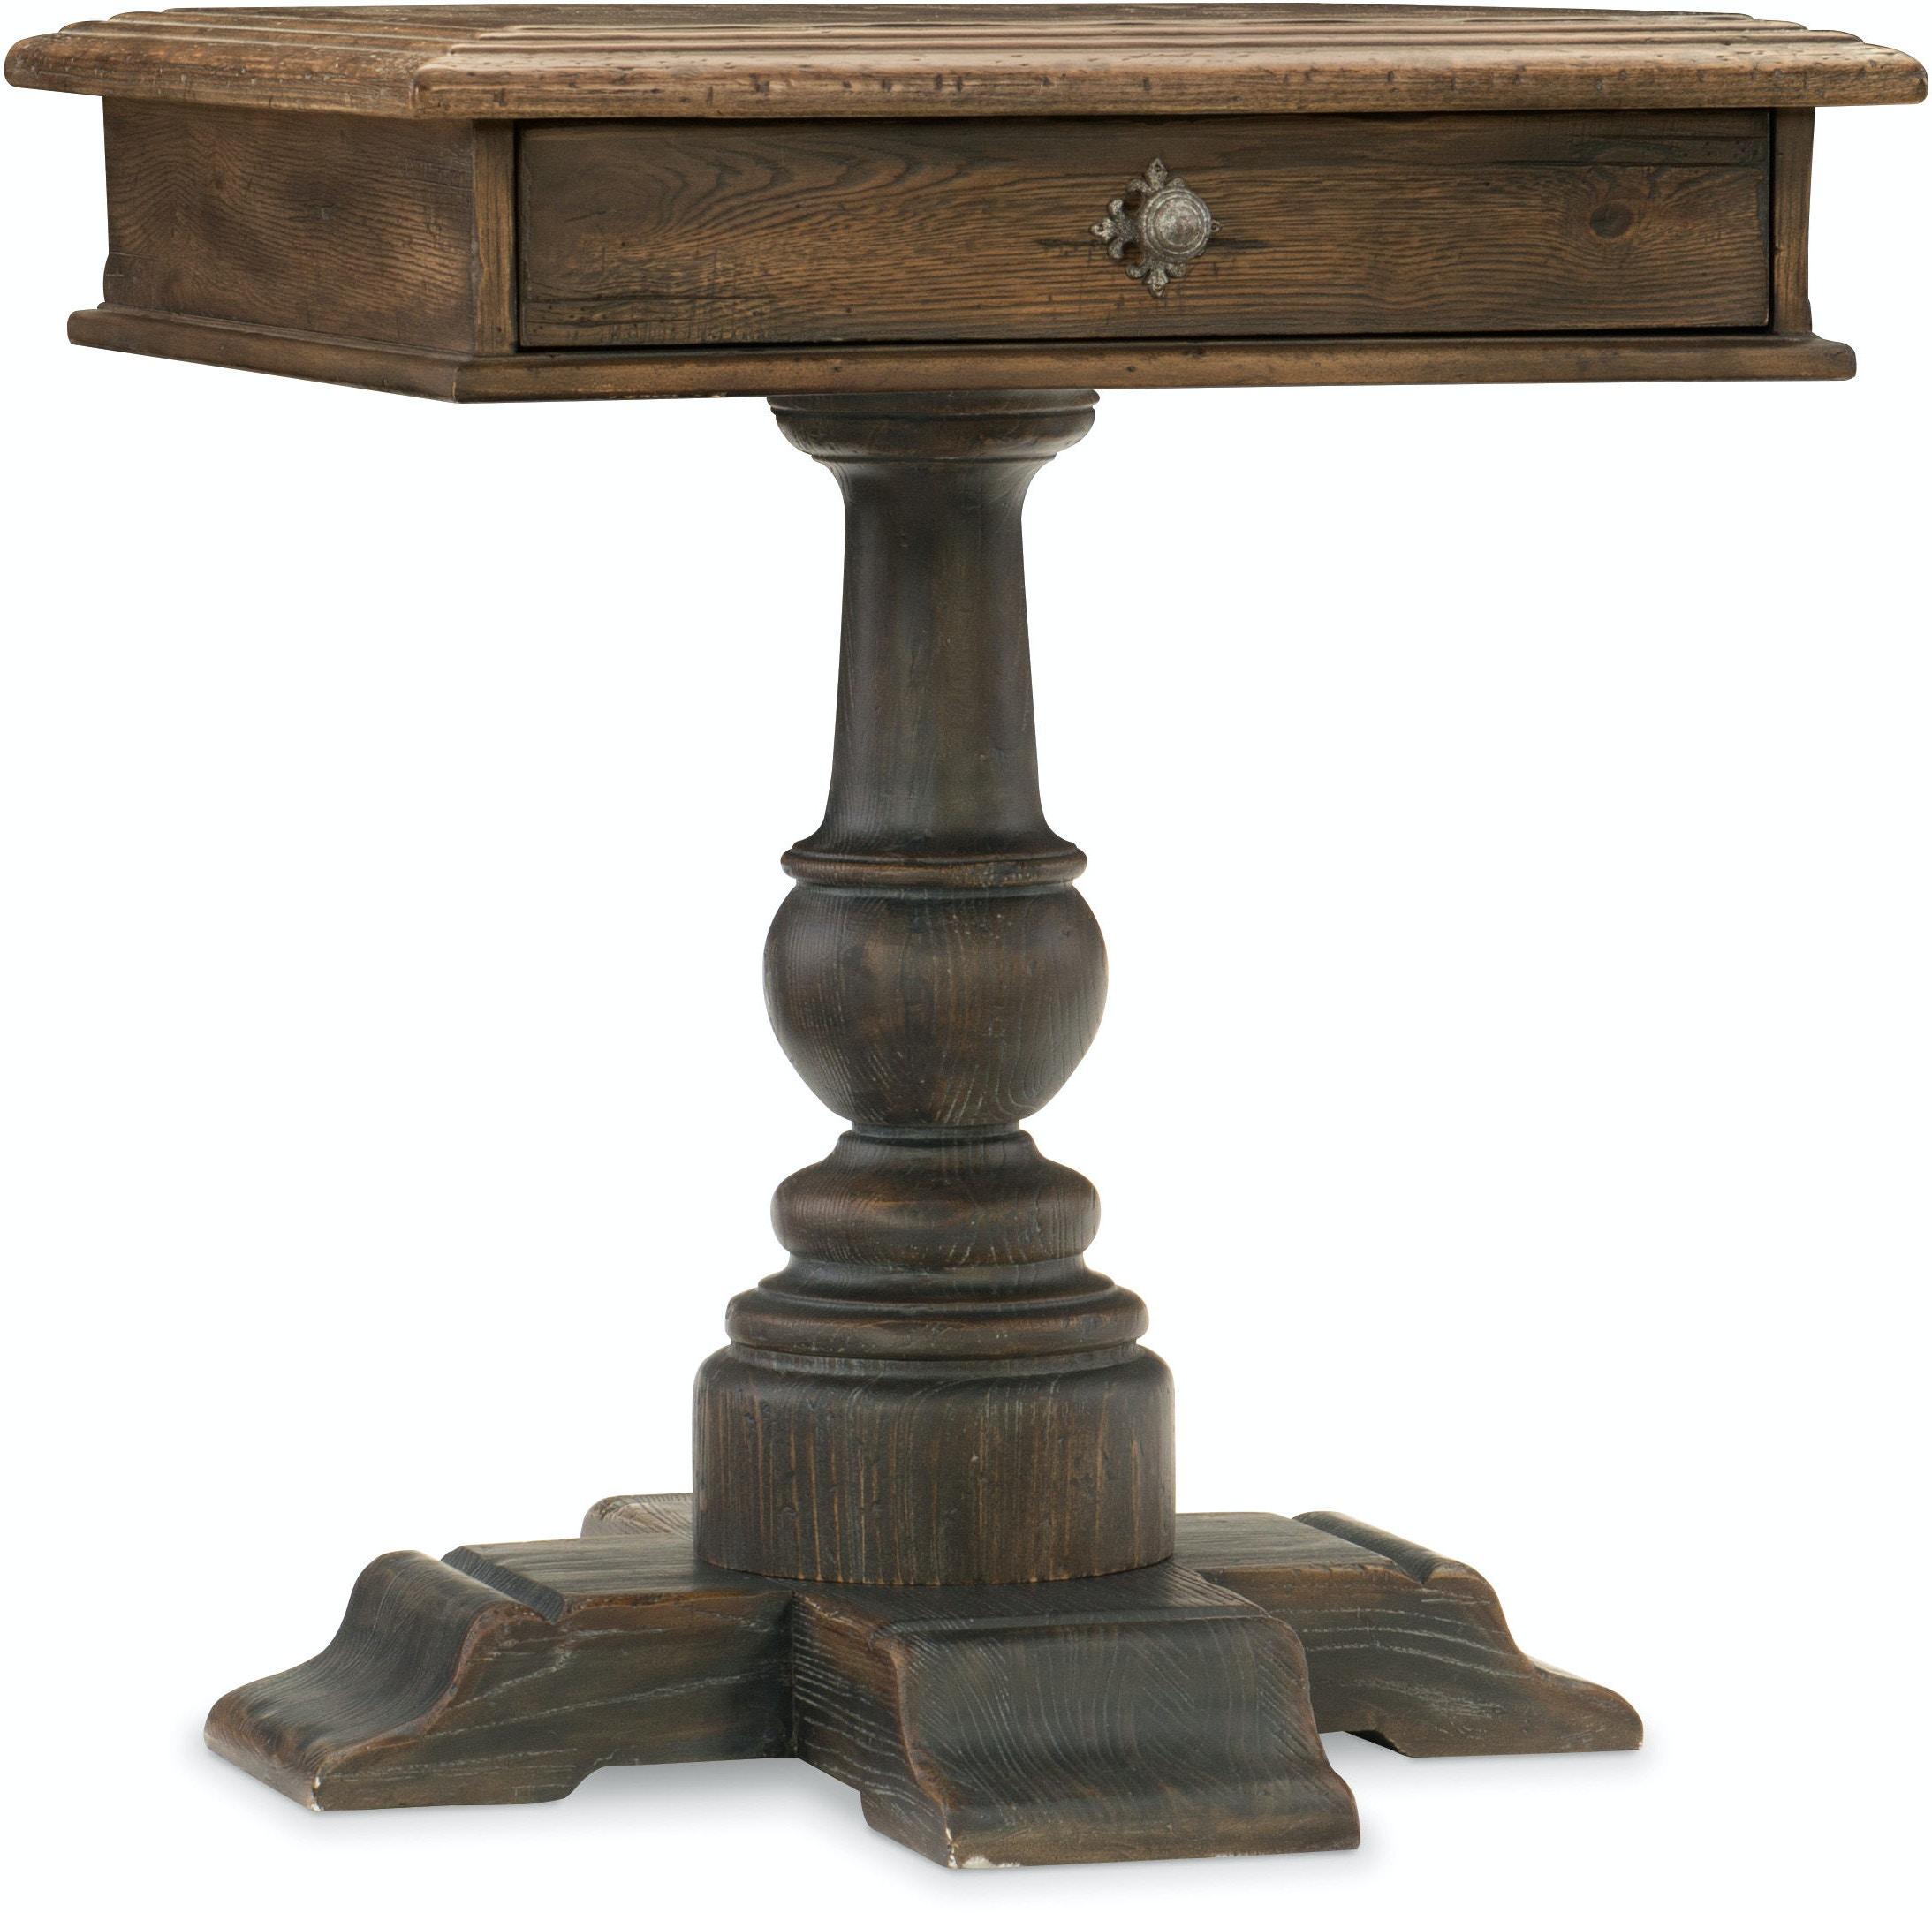 Hooker Furniture Bedroom Kirby Bedside Table 5960 90015 Multi